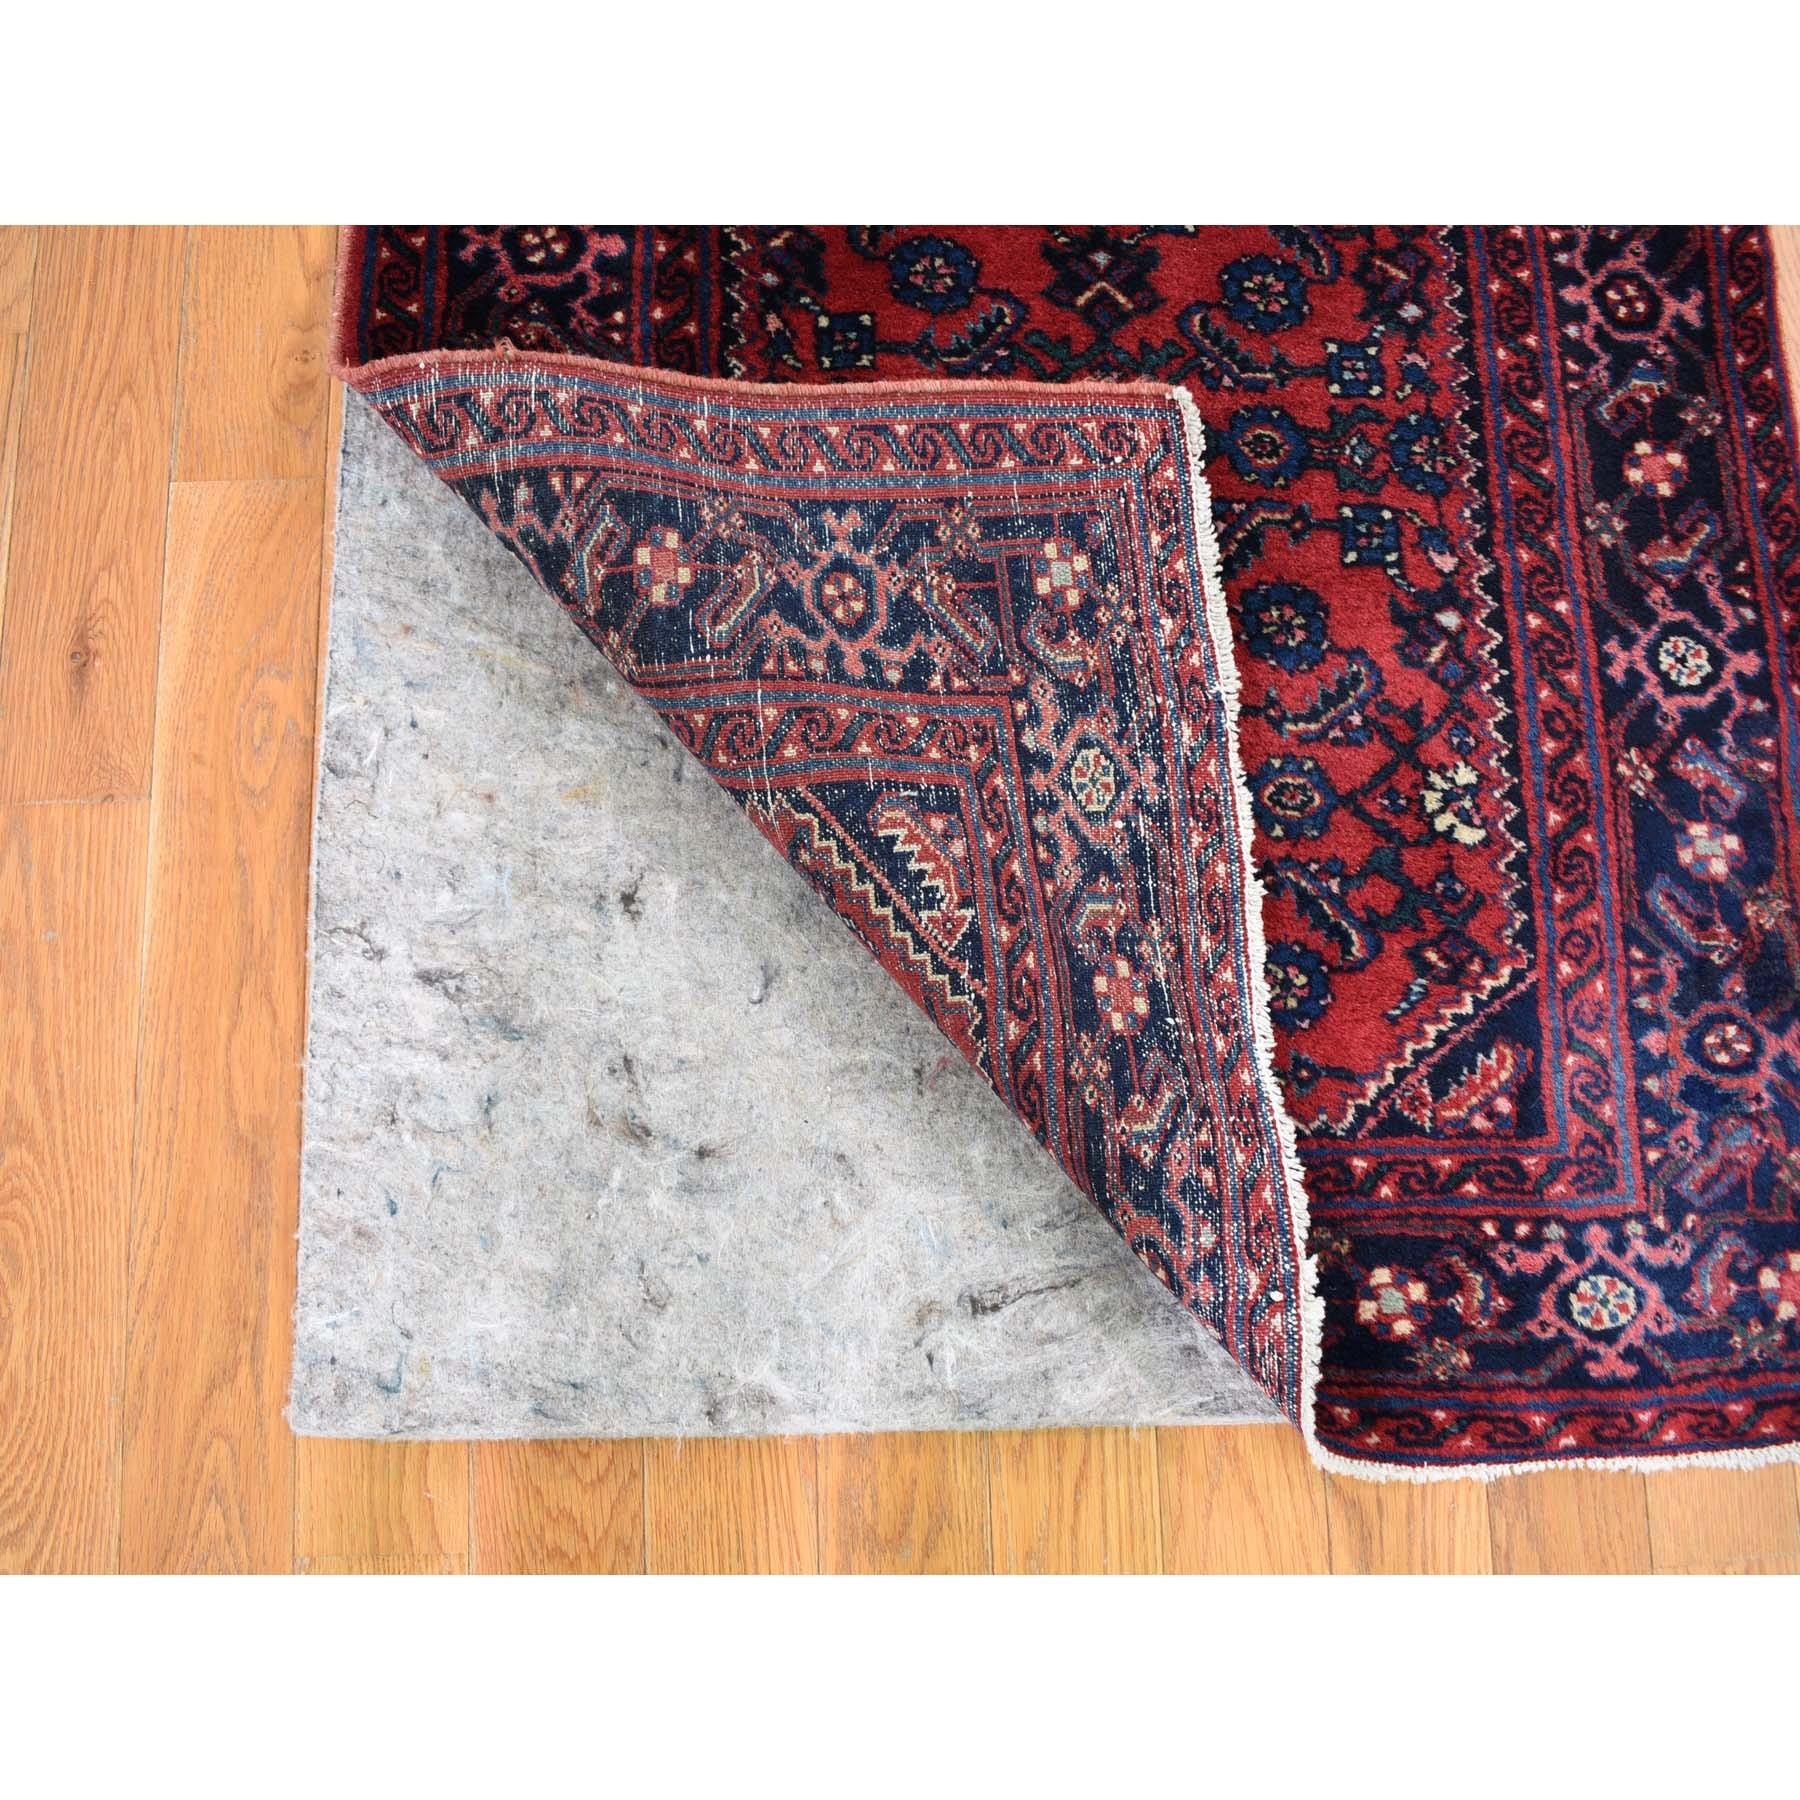 "2'8""x16'8"" Red Antique Persian Hamadan XL Runner Fish Design Dense Weave Oriental Rug"